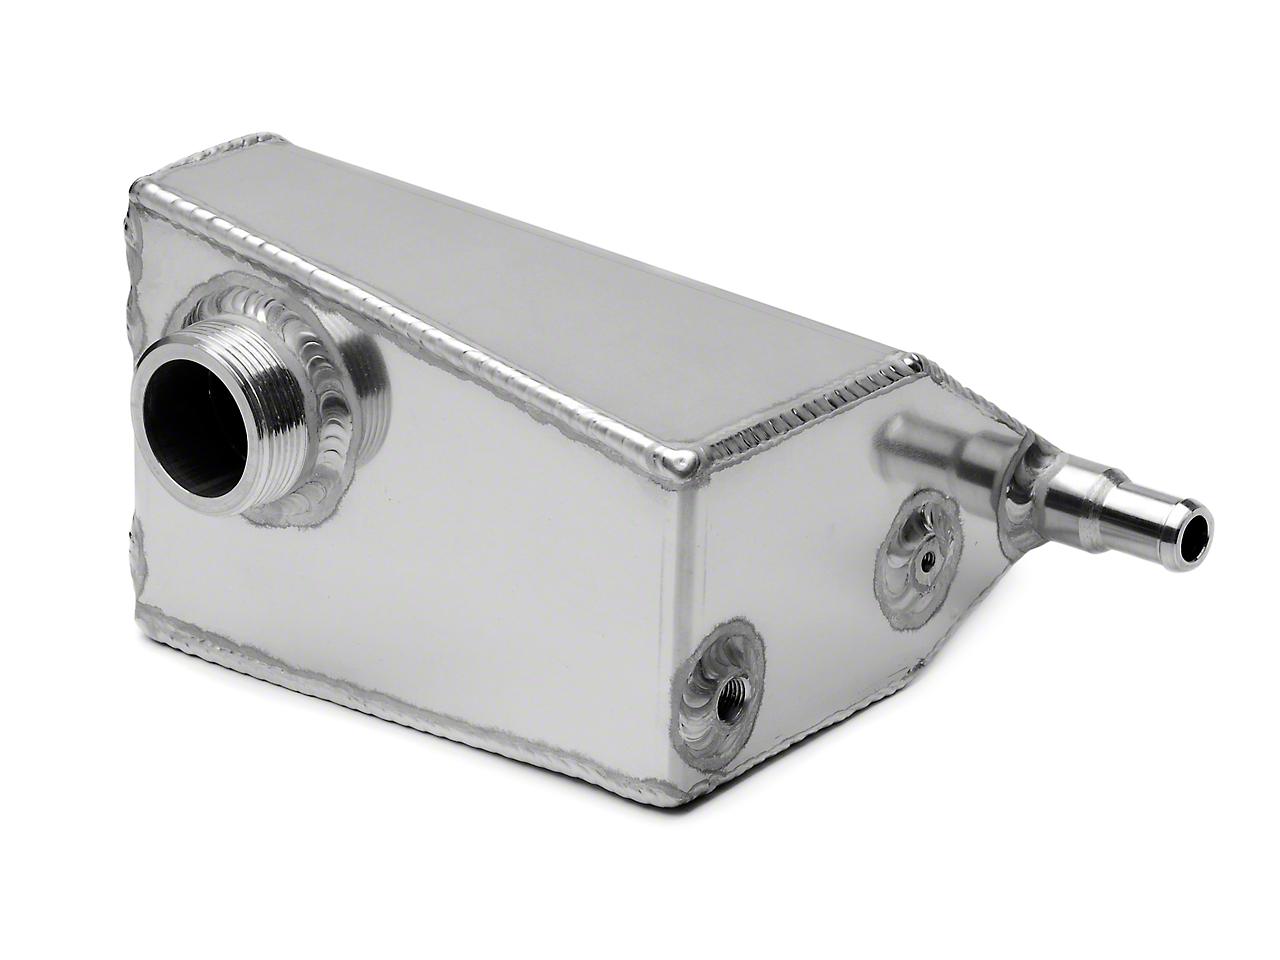 Canton Aluminum Expansion Tank for Vortech/Paxton Superchargers (05-09 GT)